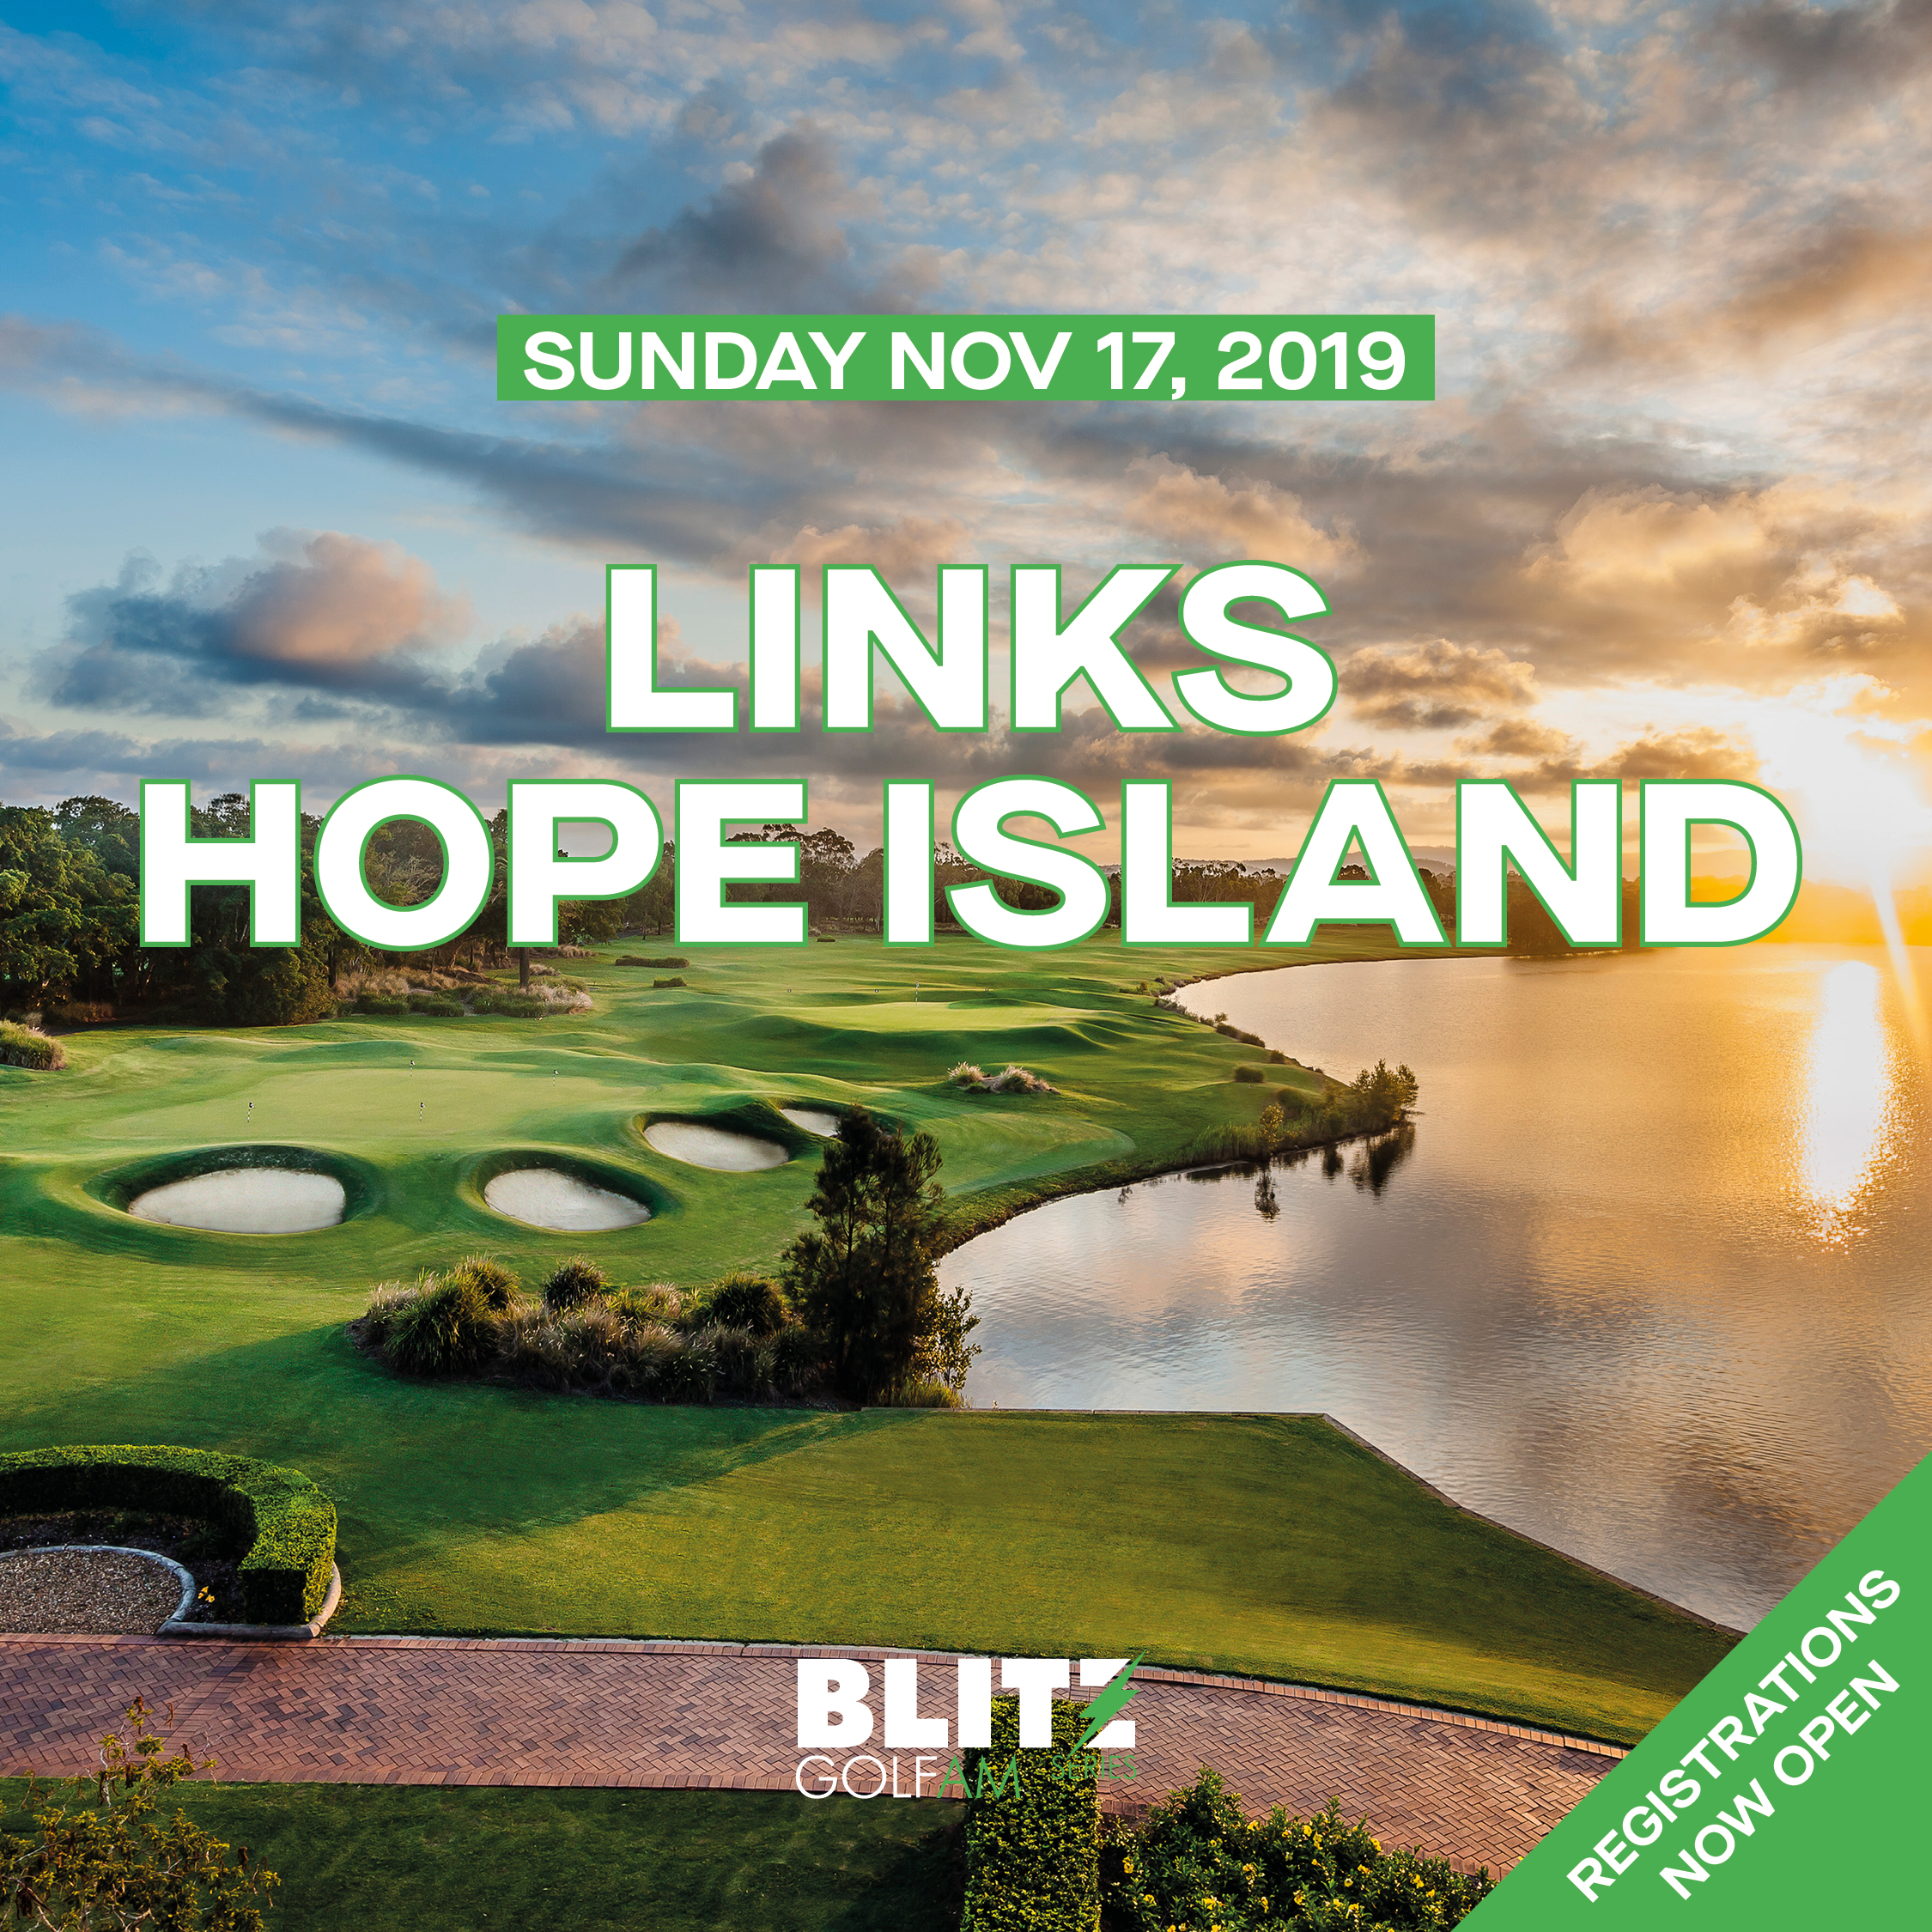 QLD_Links Hope Island_Blitz 2020_AM Series Launch_171119.jpg